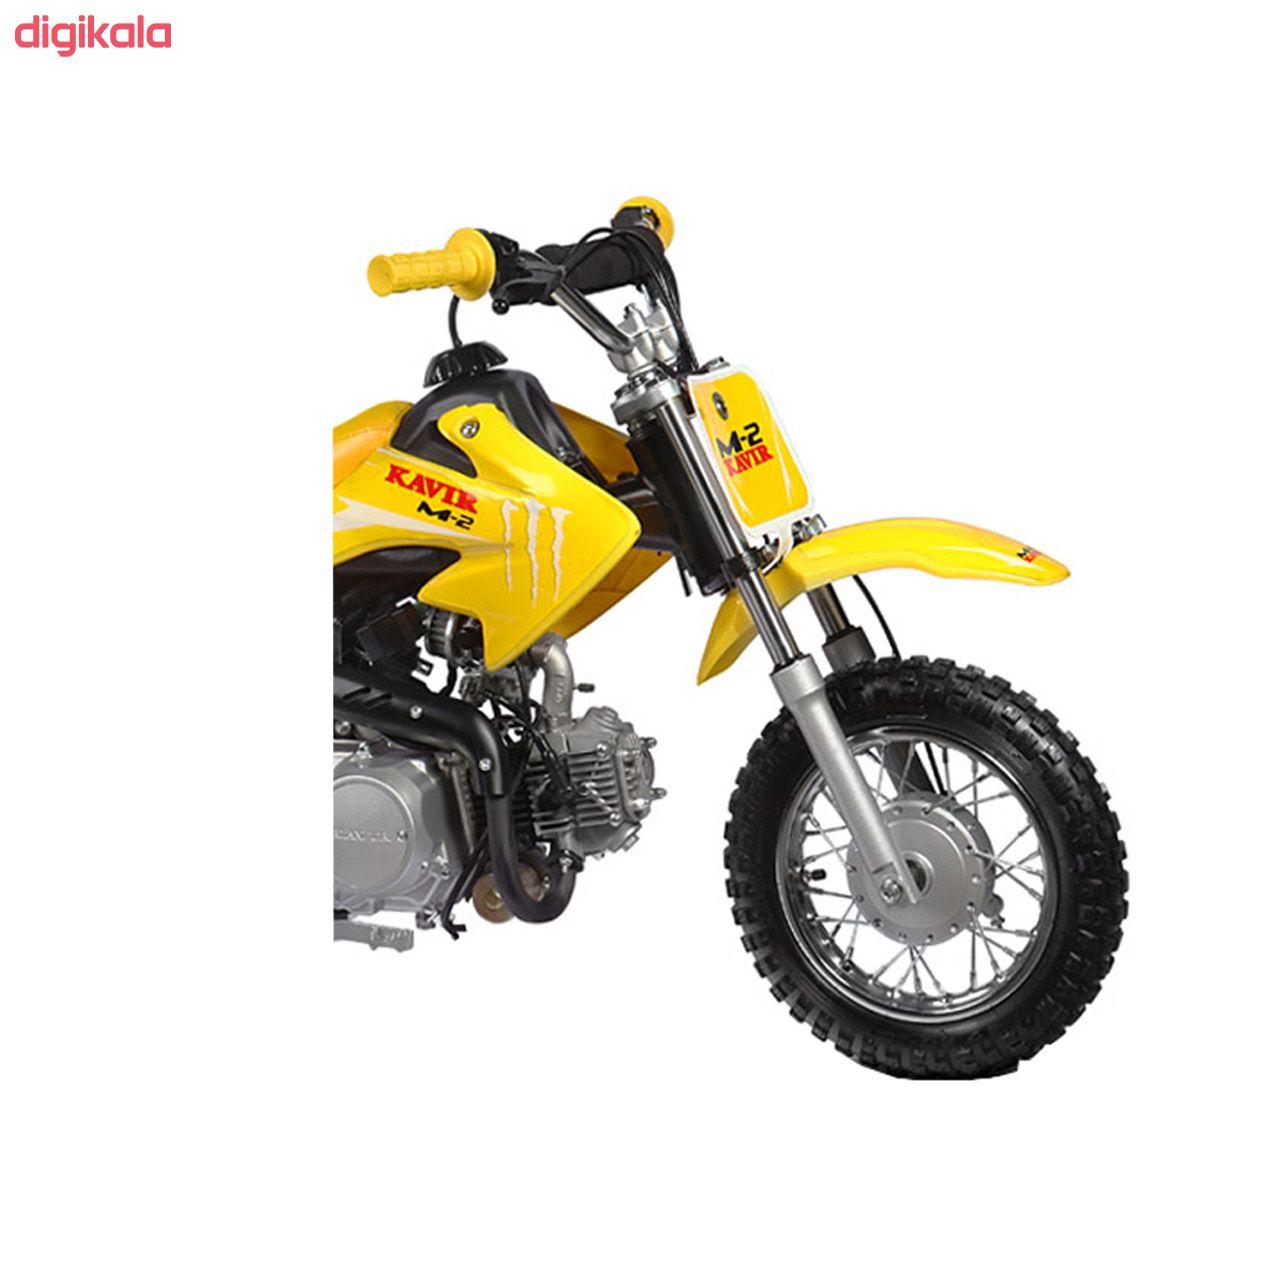 موتورسیکلت کویر مدل مینی  70MT2 سی سی سال 1399 main 1 1